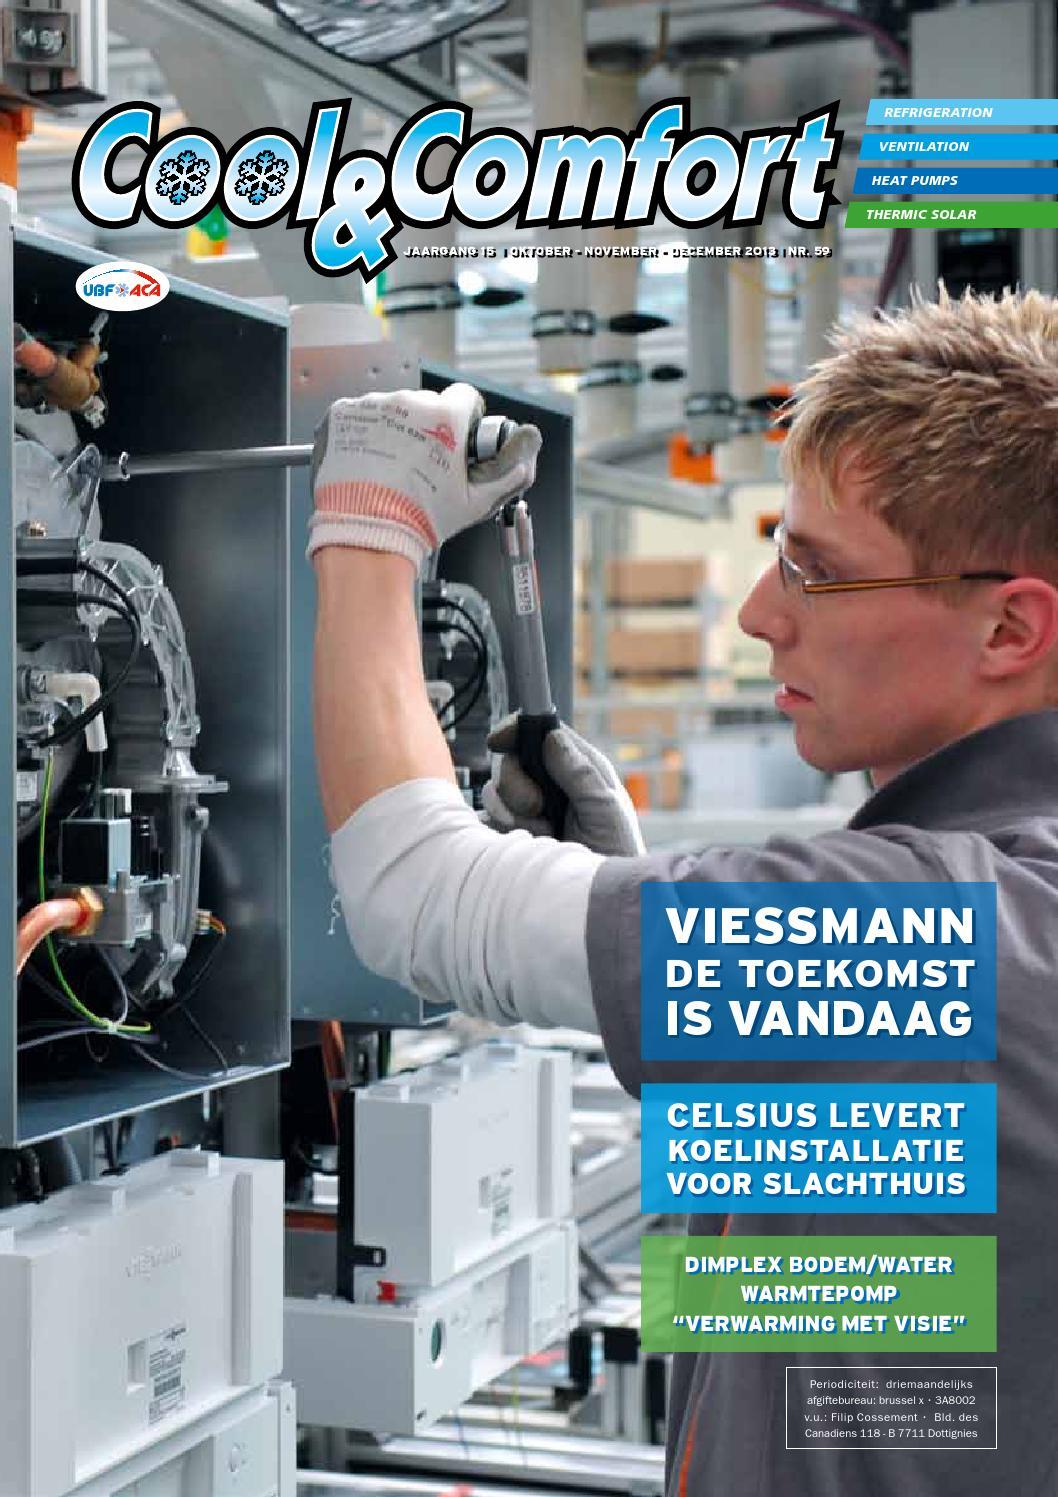 Cool & comfort 57 nl by coolandcomfortmagazine   issuu